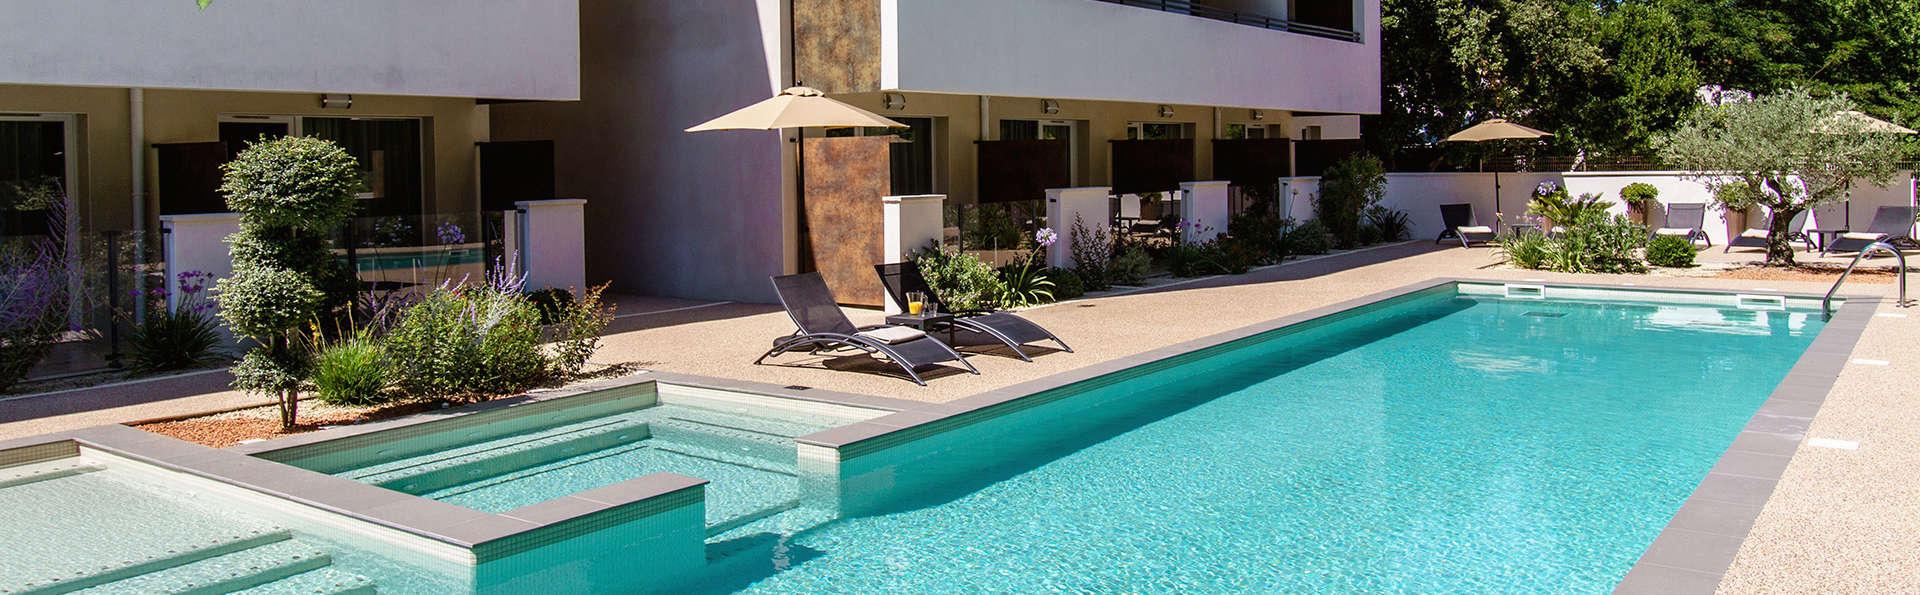 Forme-hotel Montpellier - EDIT_Pool_6.jpg